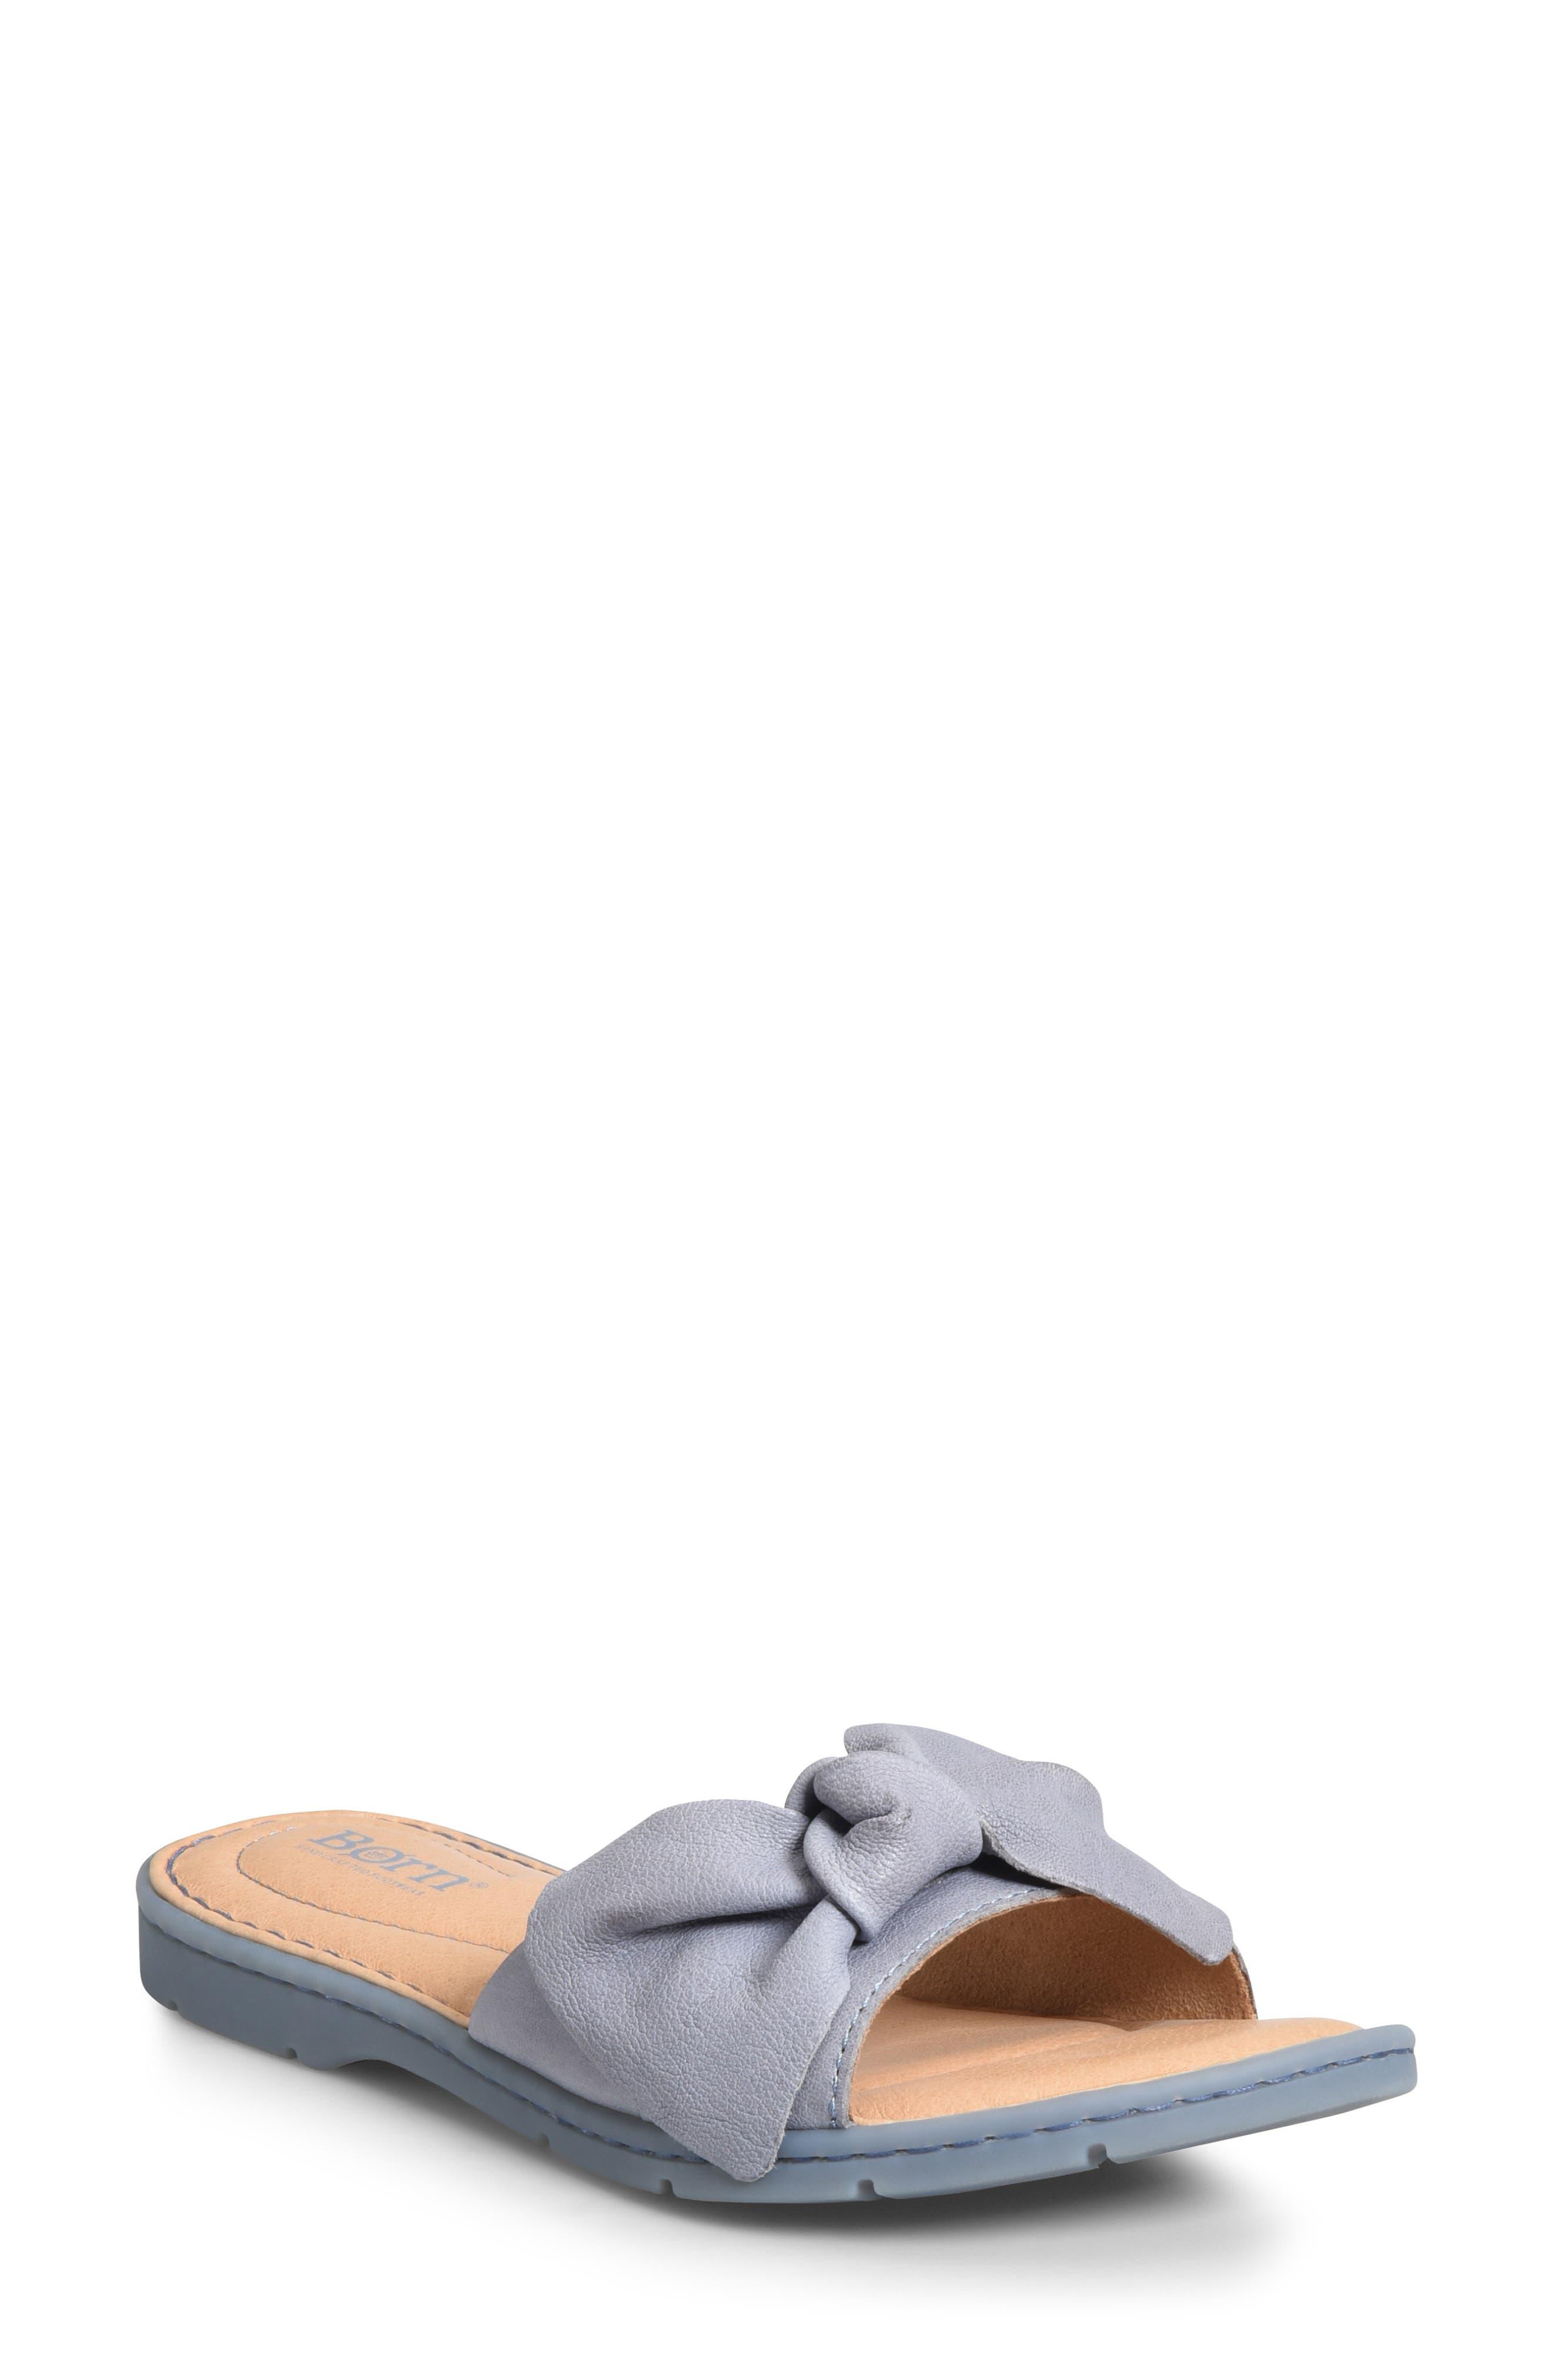 B?rn Teton Knotted Slide Sandal, Blue